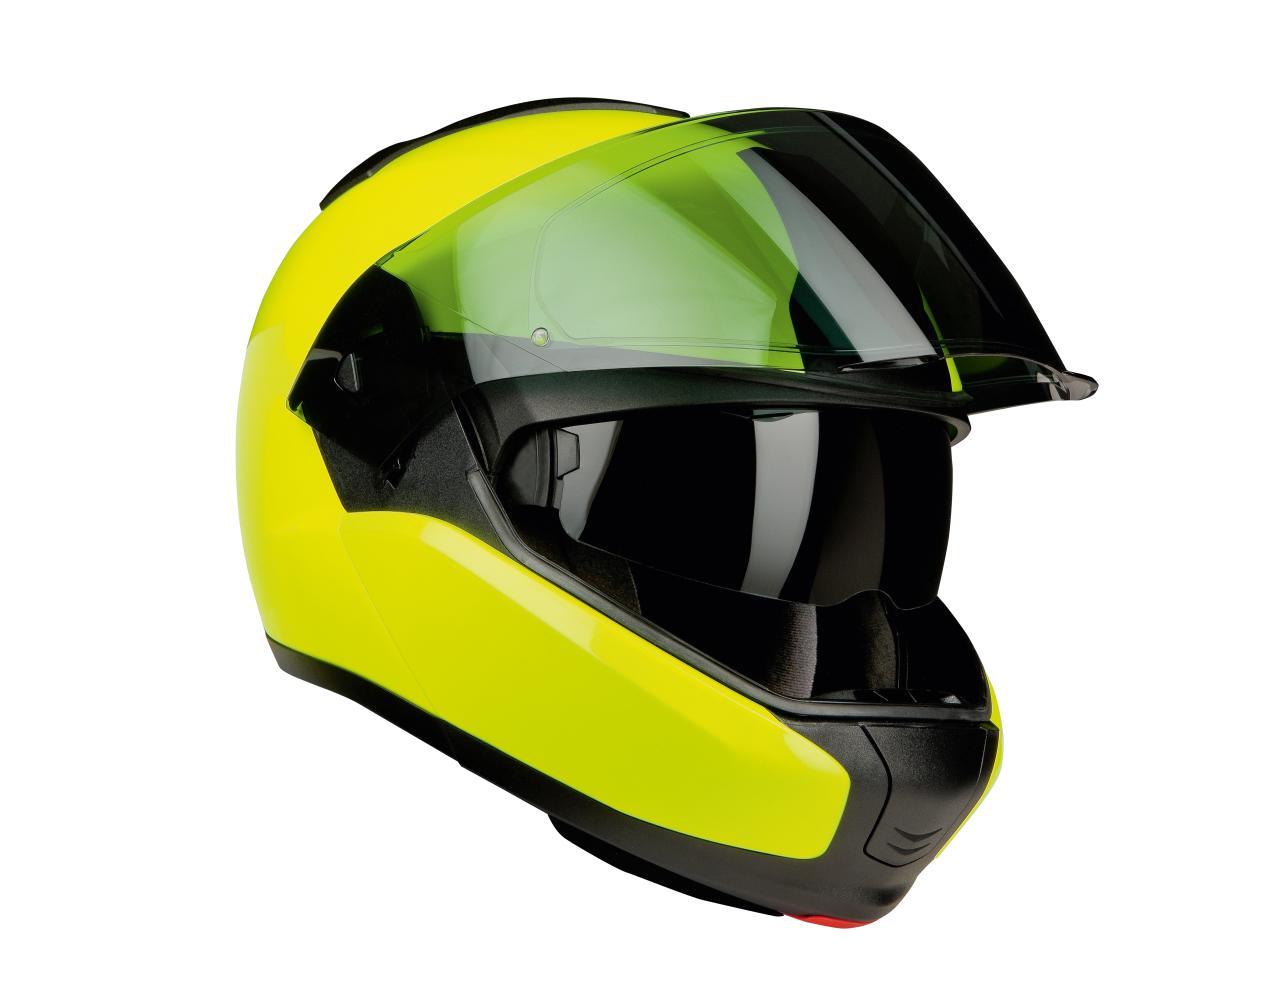 revista coche bmw motorrad presenta su casco system 6 en amarillo fluorescente. Black Bedroom Furniture Sets. Home Design Ideas